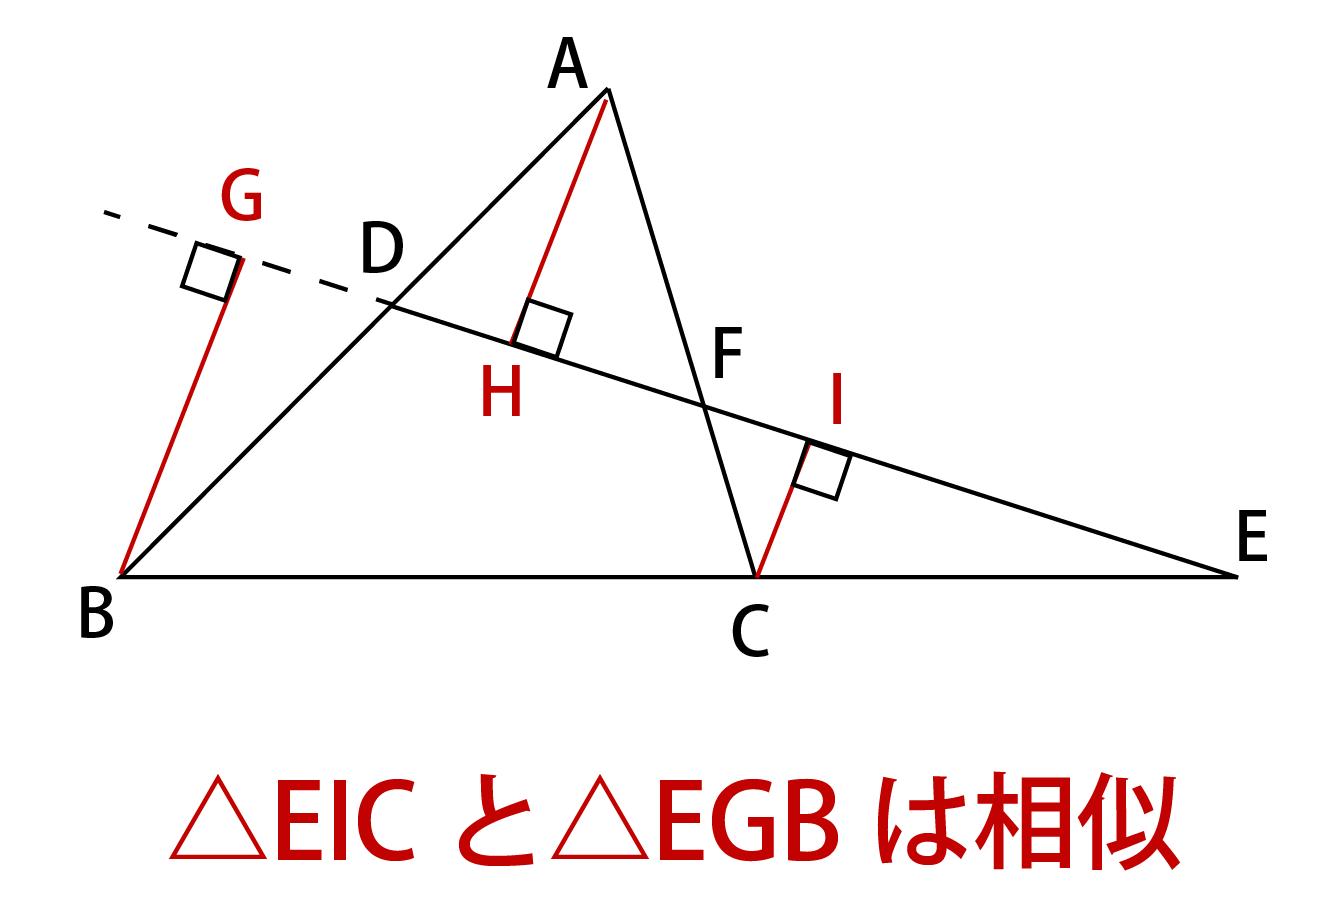 △EICと△EGBは相似